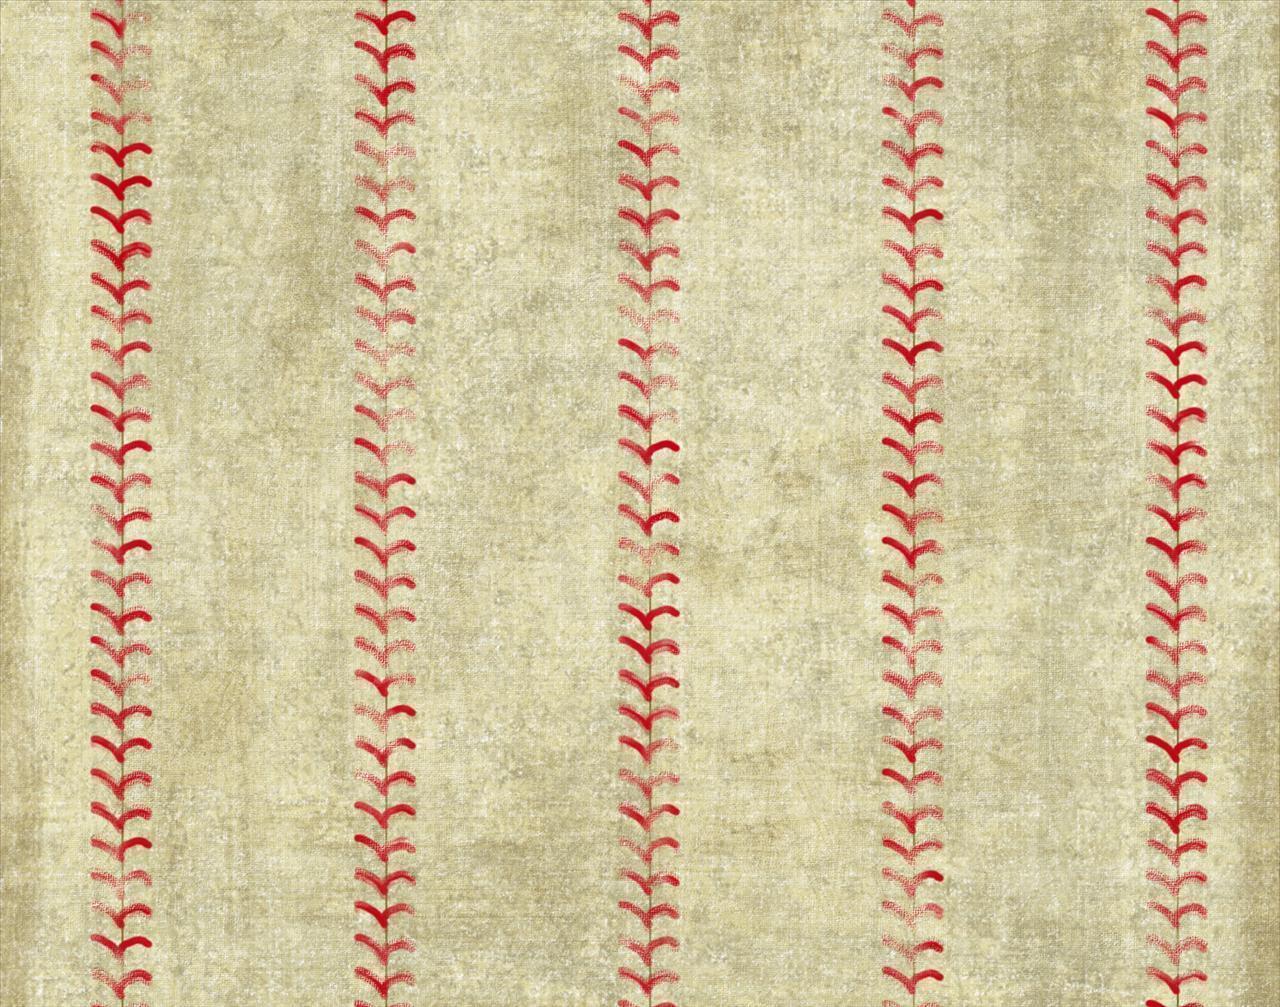 baseball backgrounds wallpaper cave